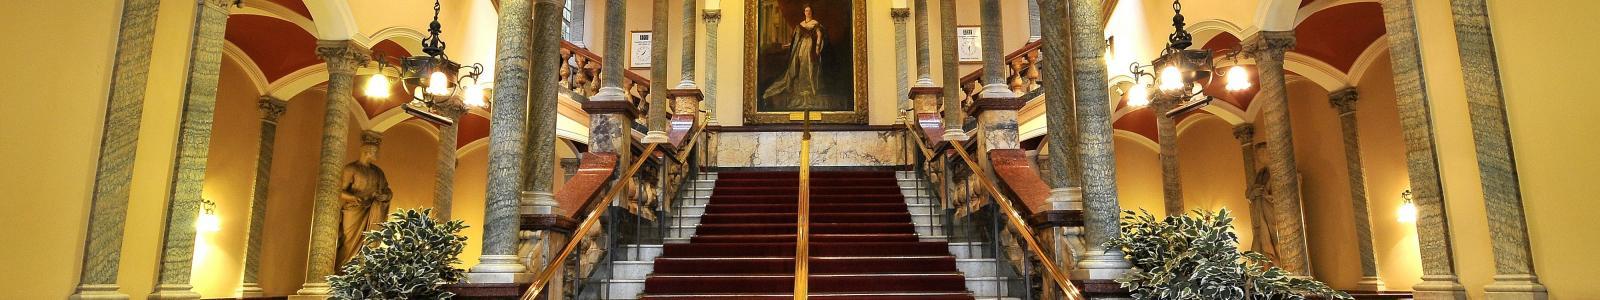 Hull Ciity Hall main staircase